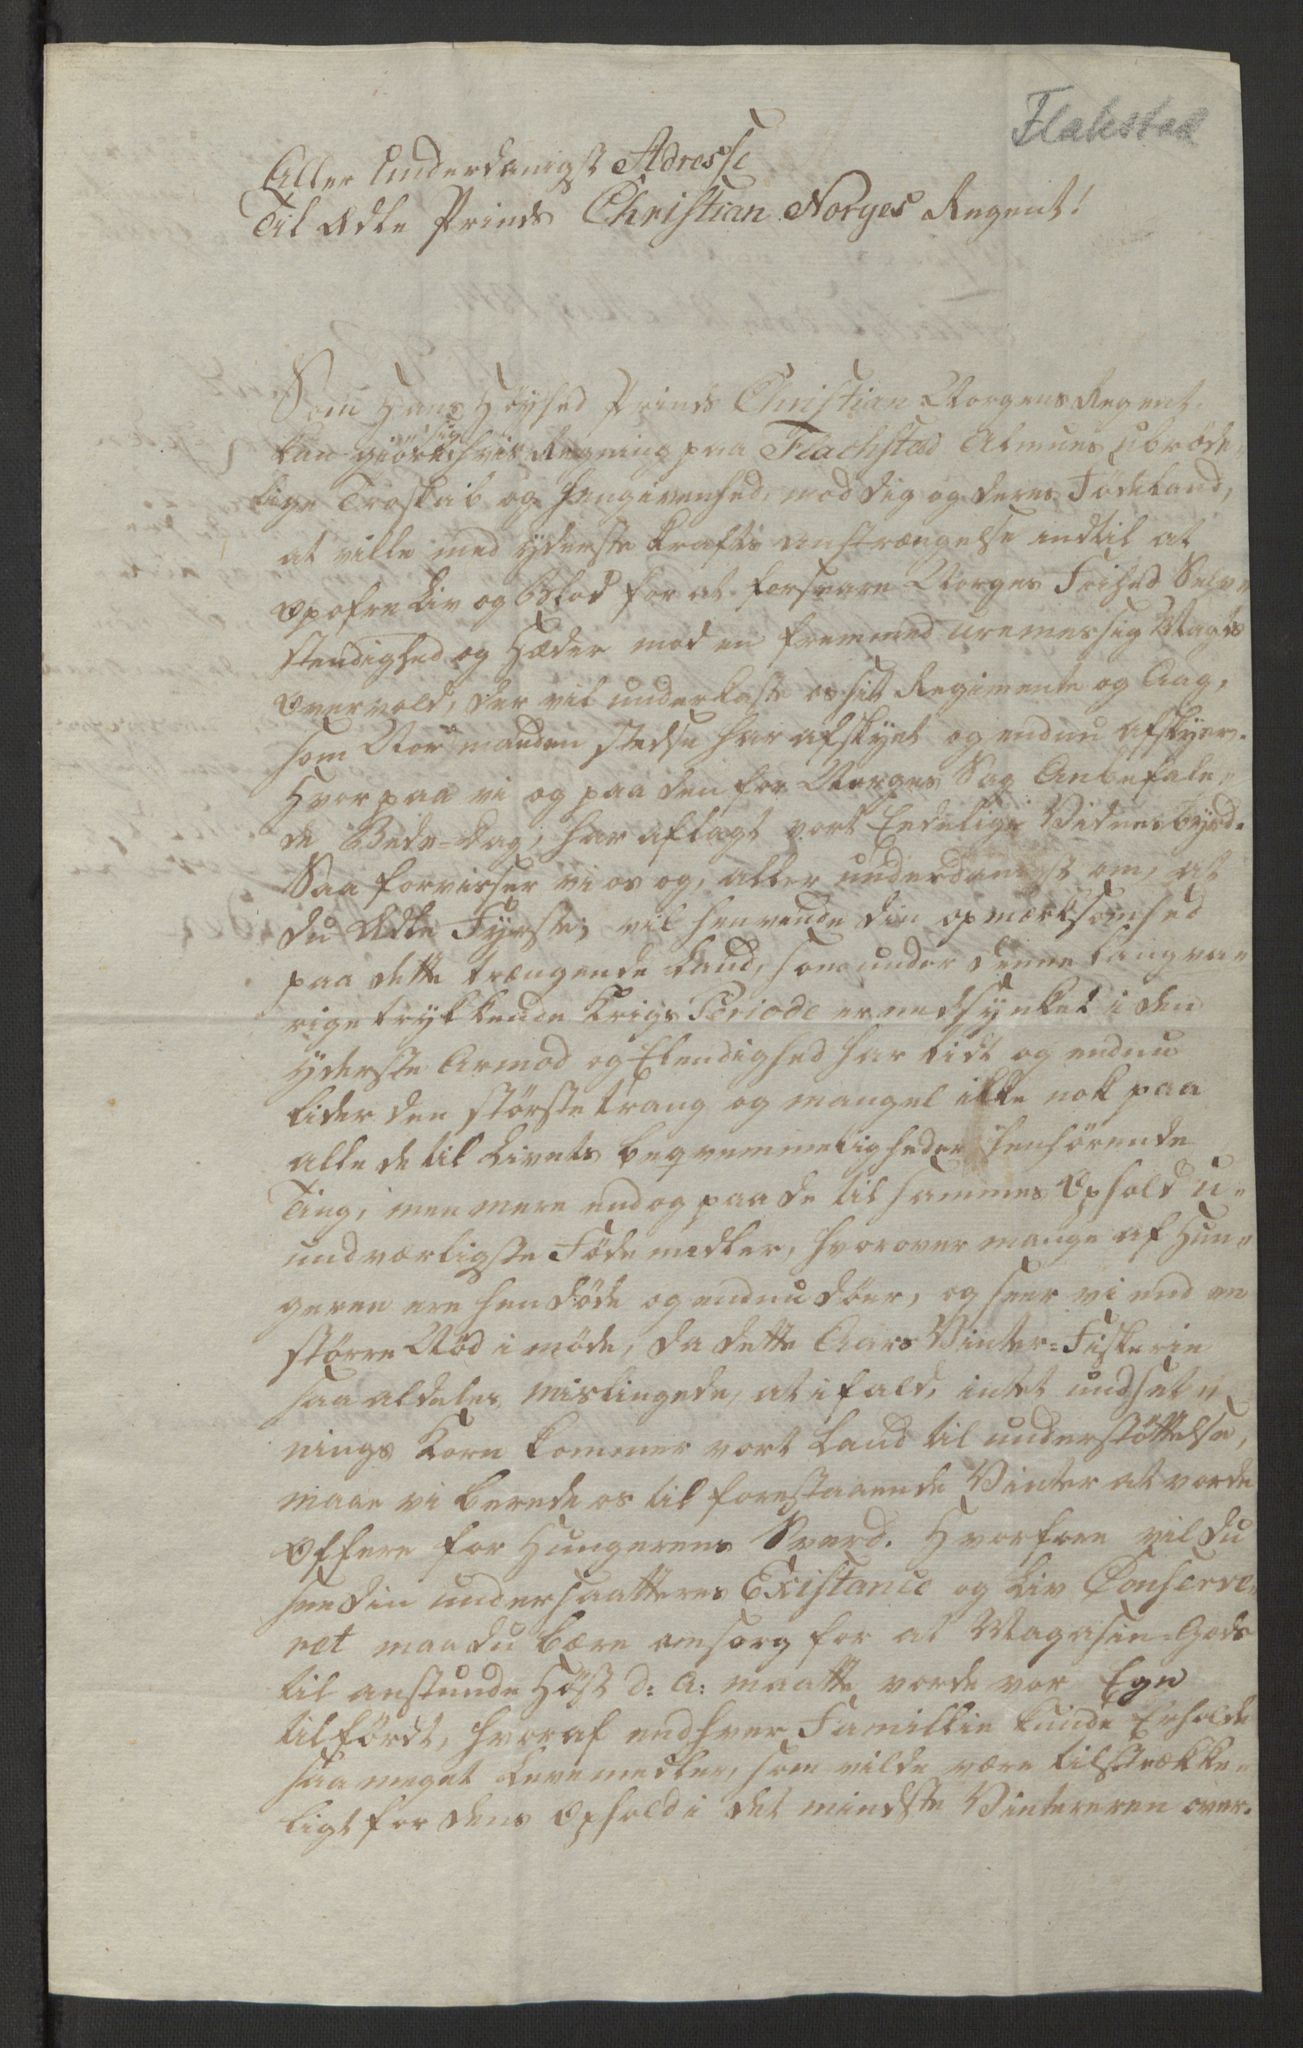 SAT, Nordland amt/fylke*, 1814, s. 26